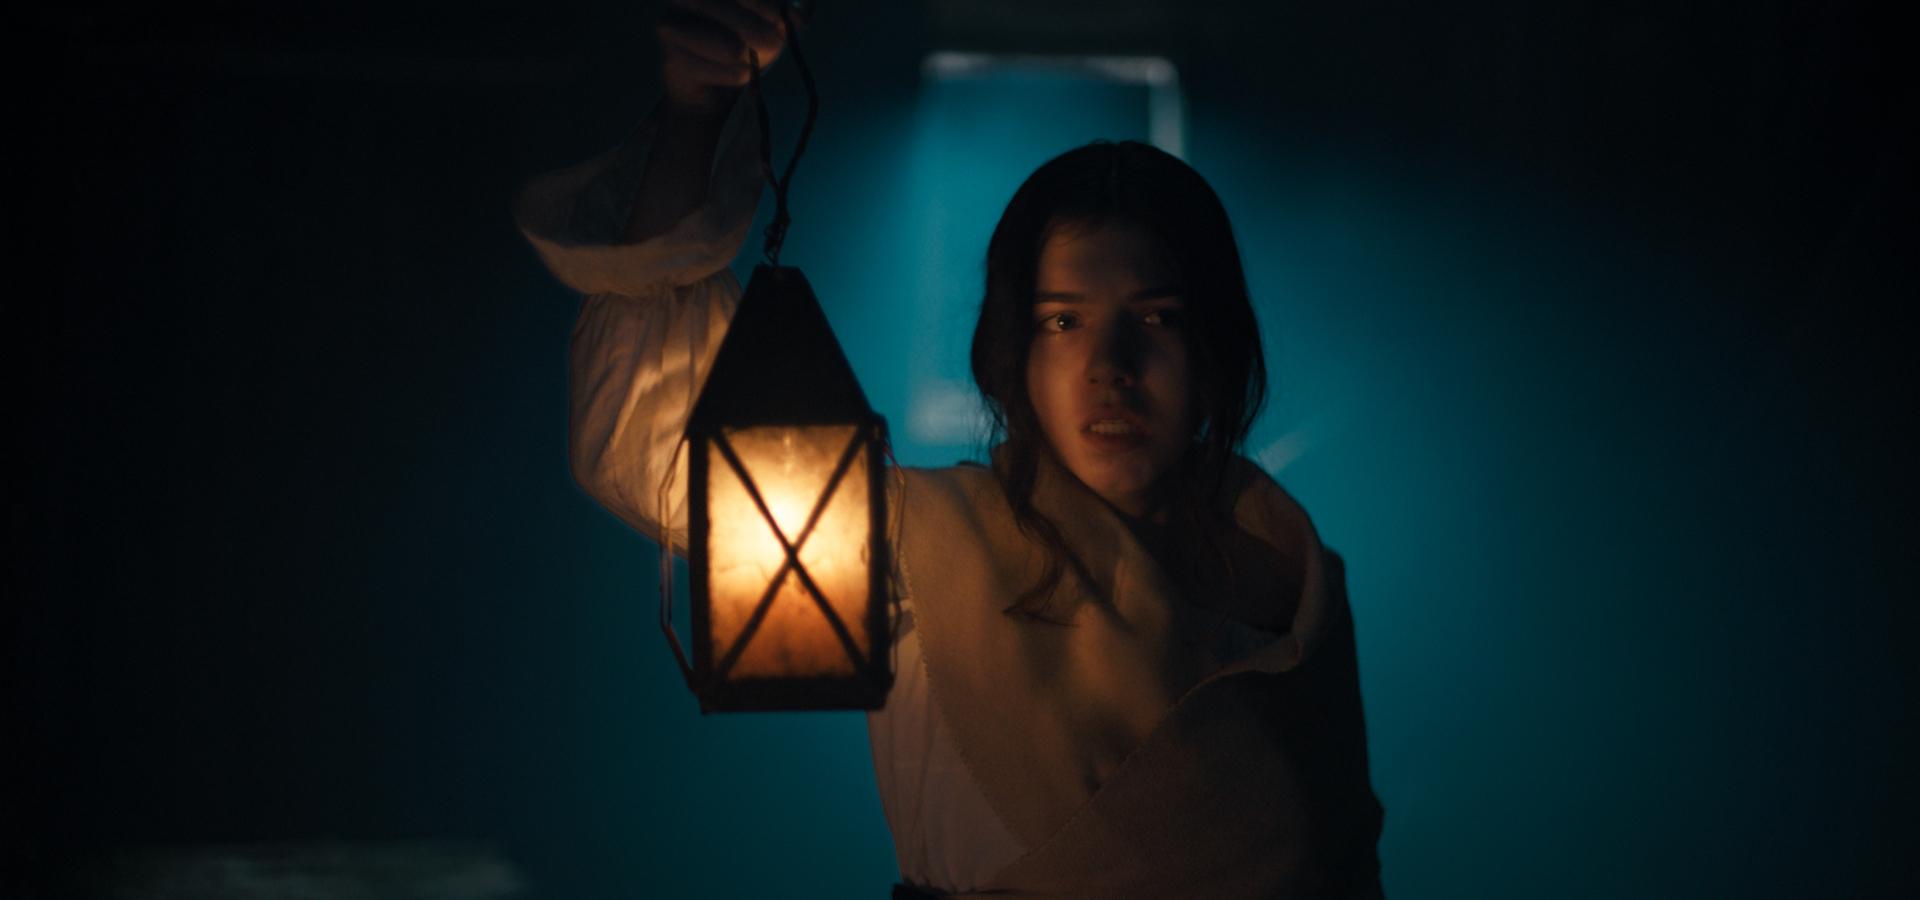 La Luz (The Light)